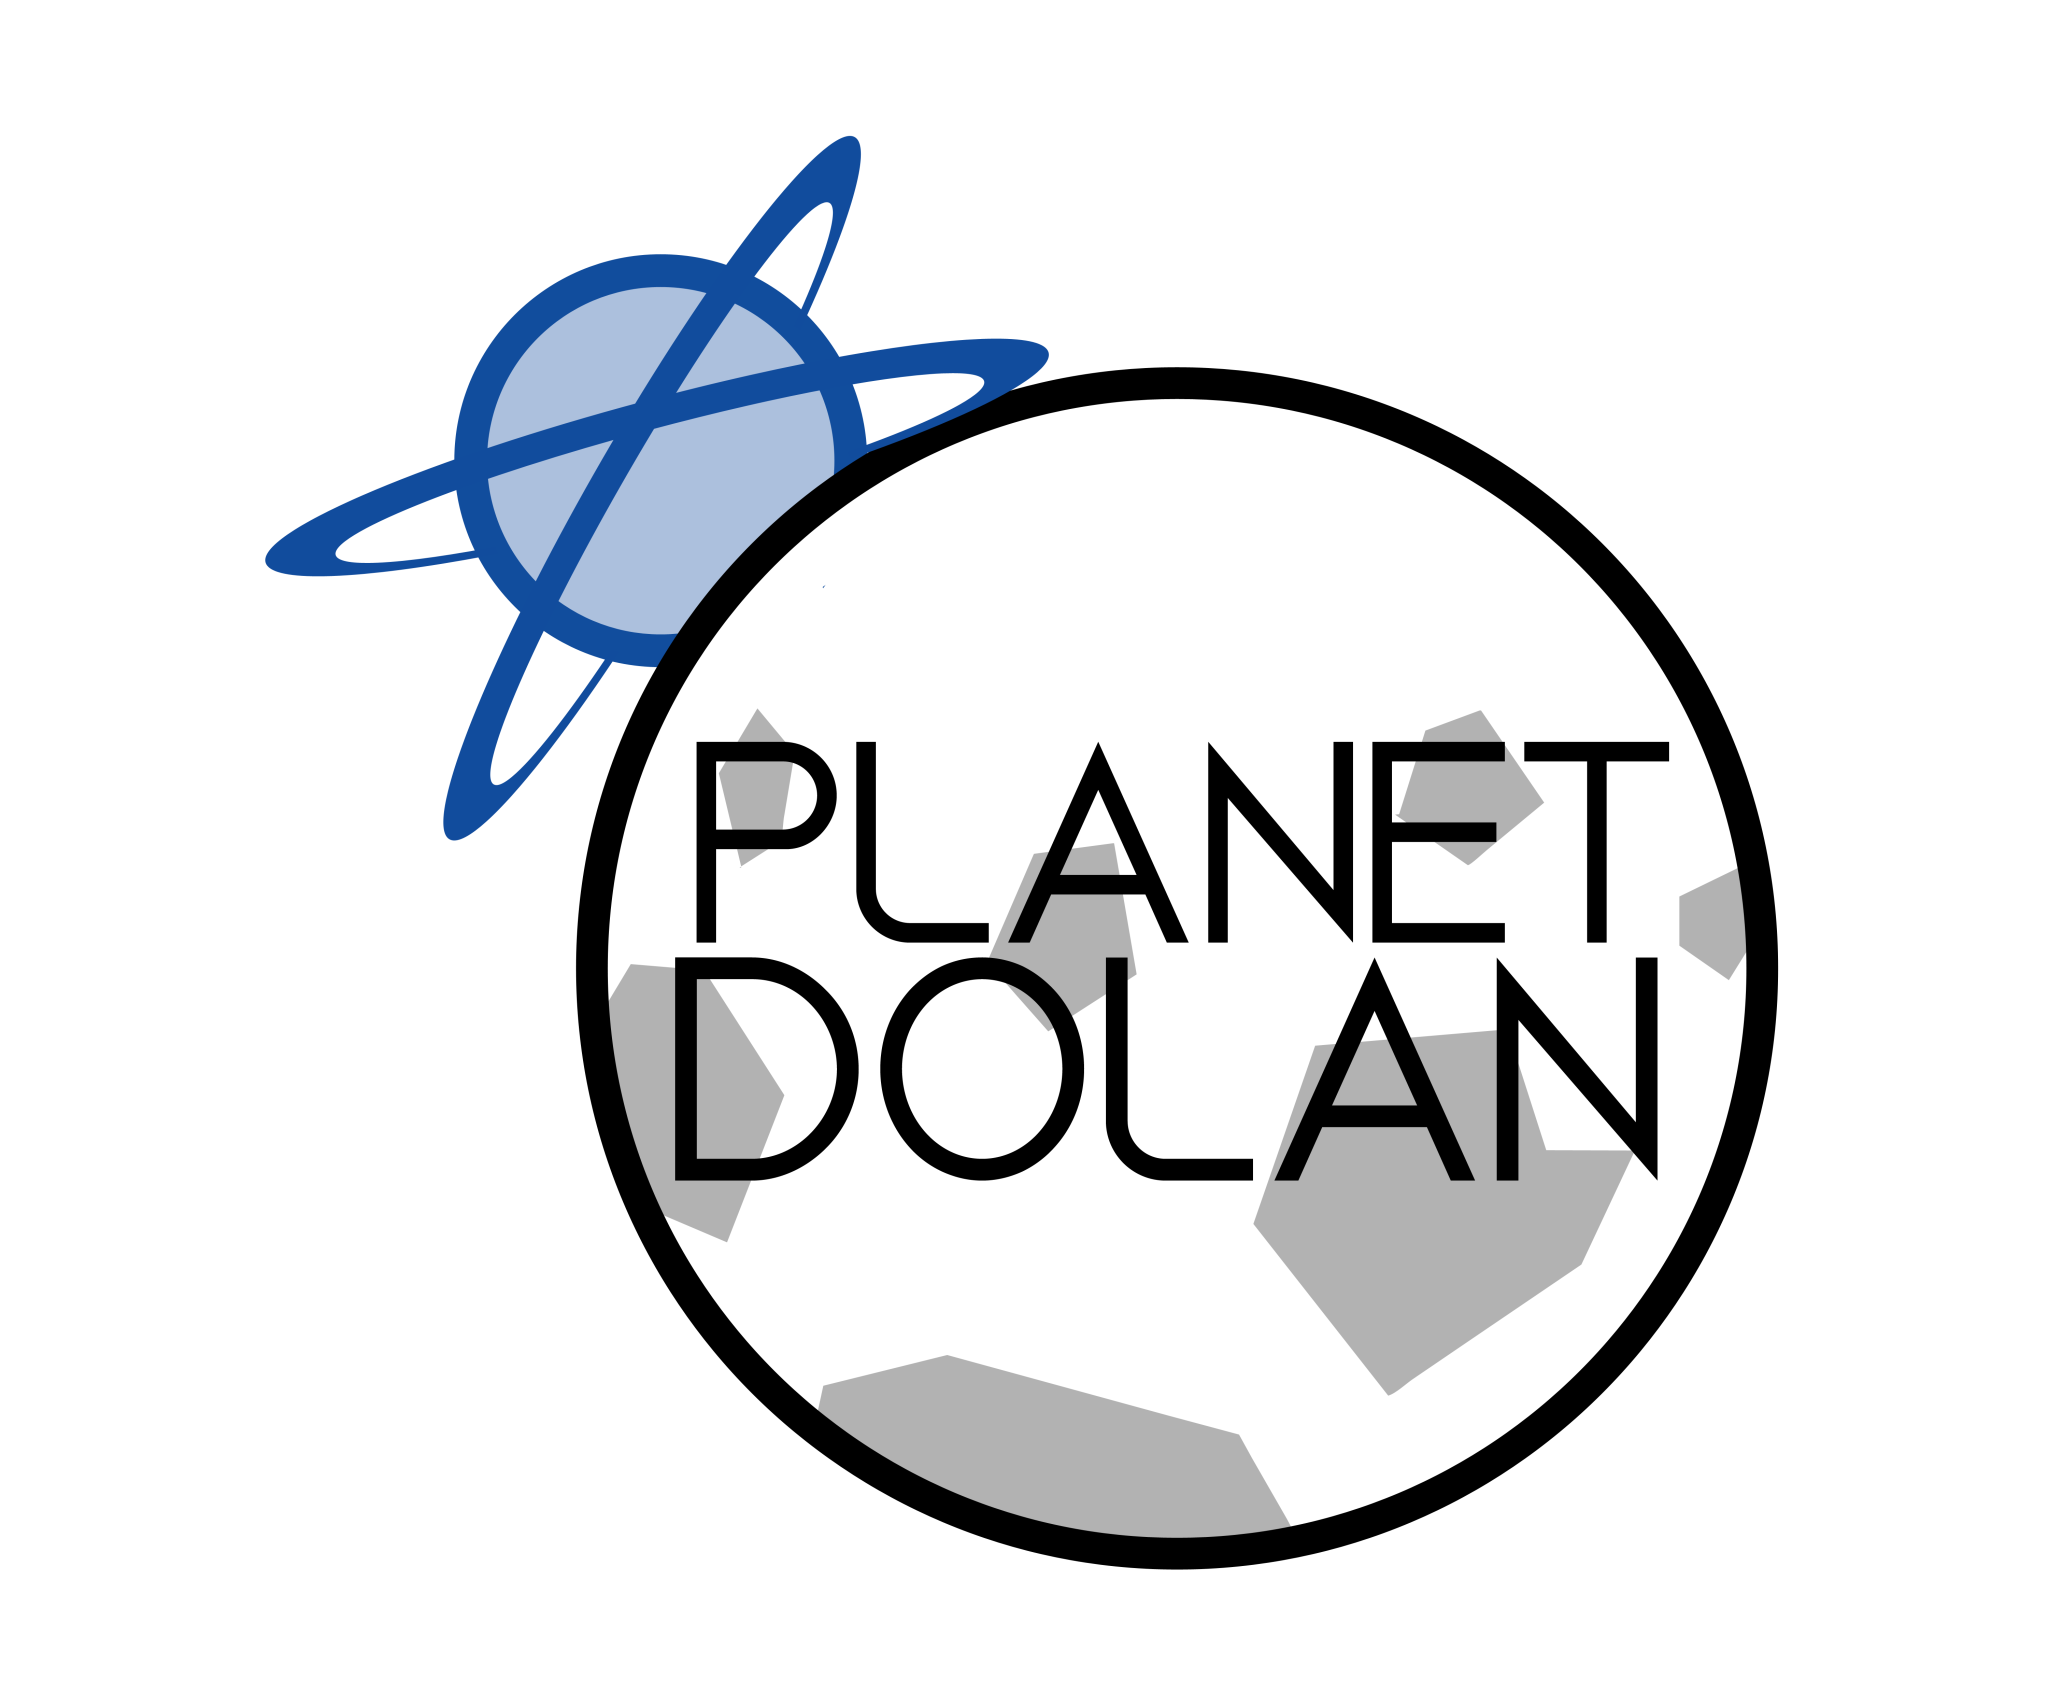 Planet-Dolan_3T_L_alt2